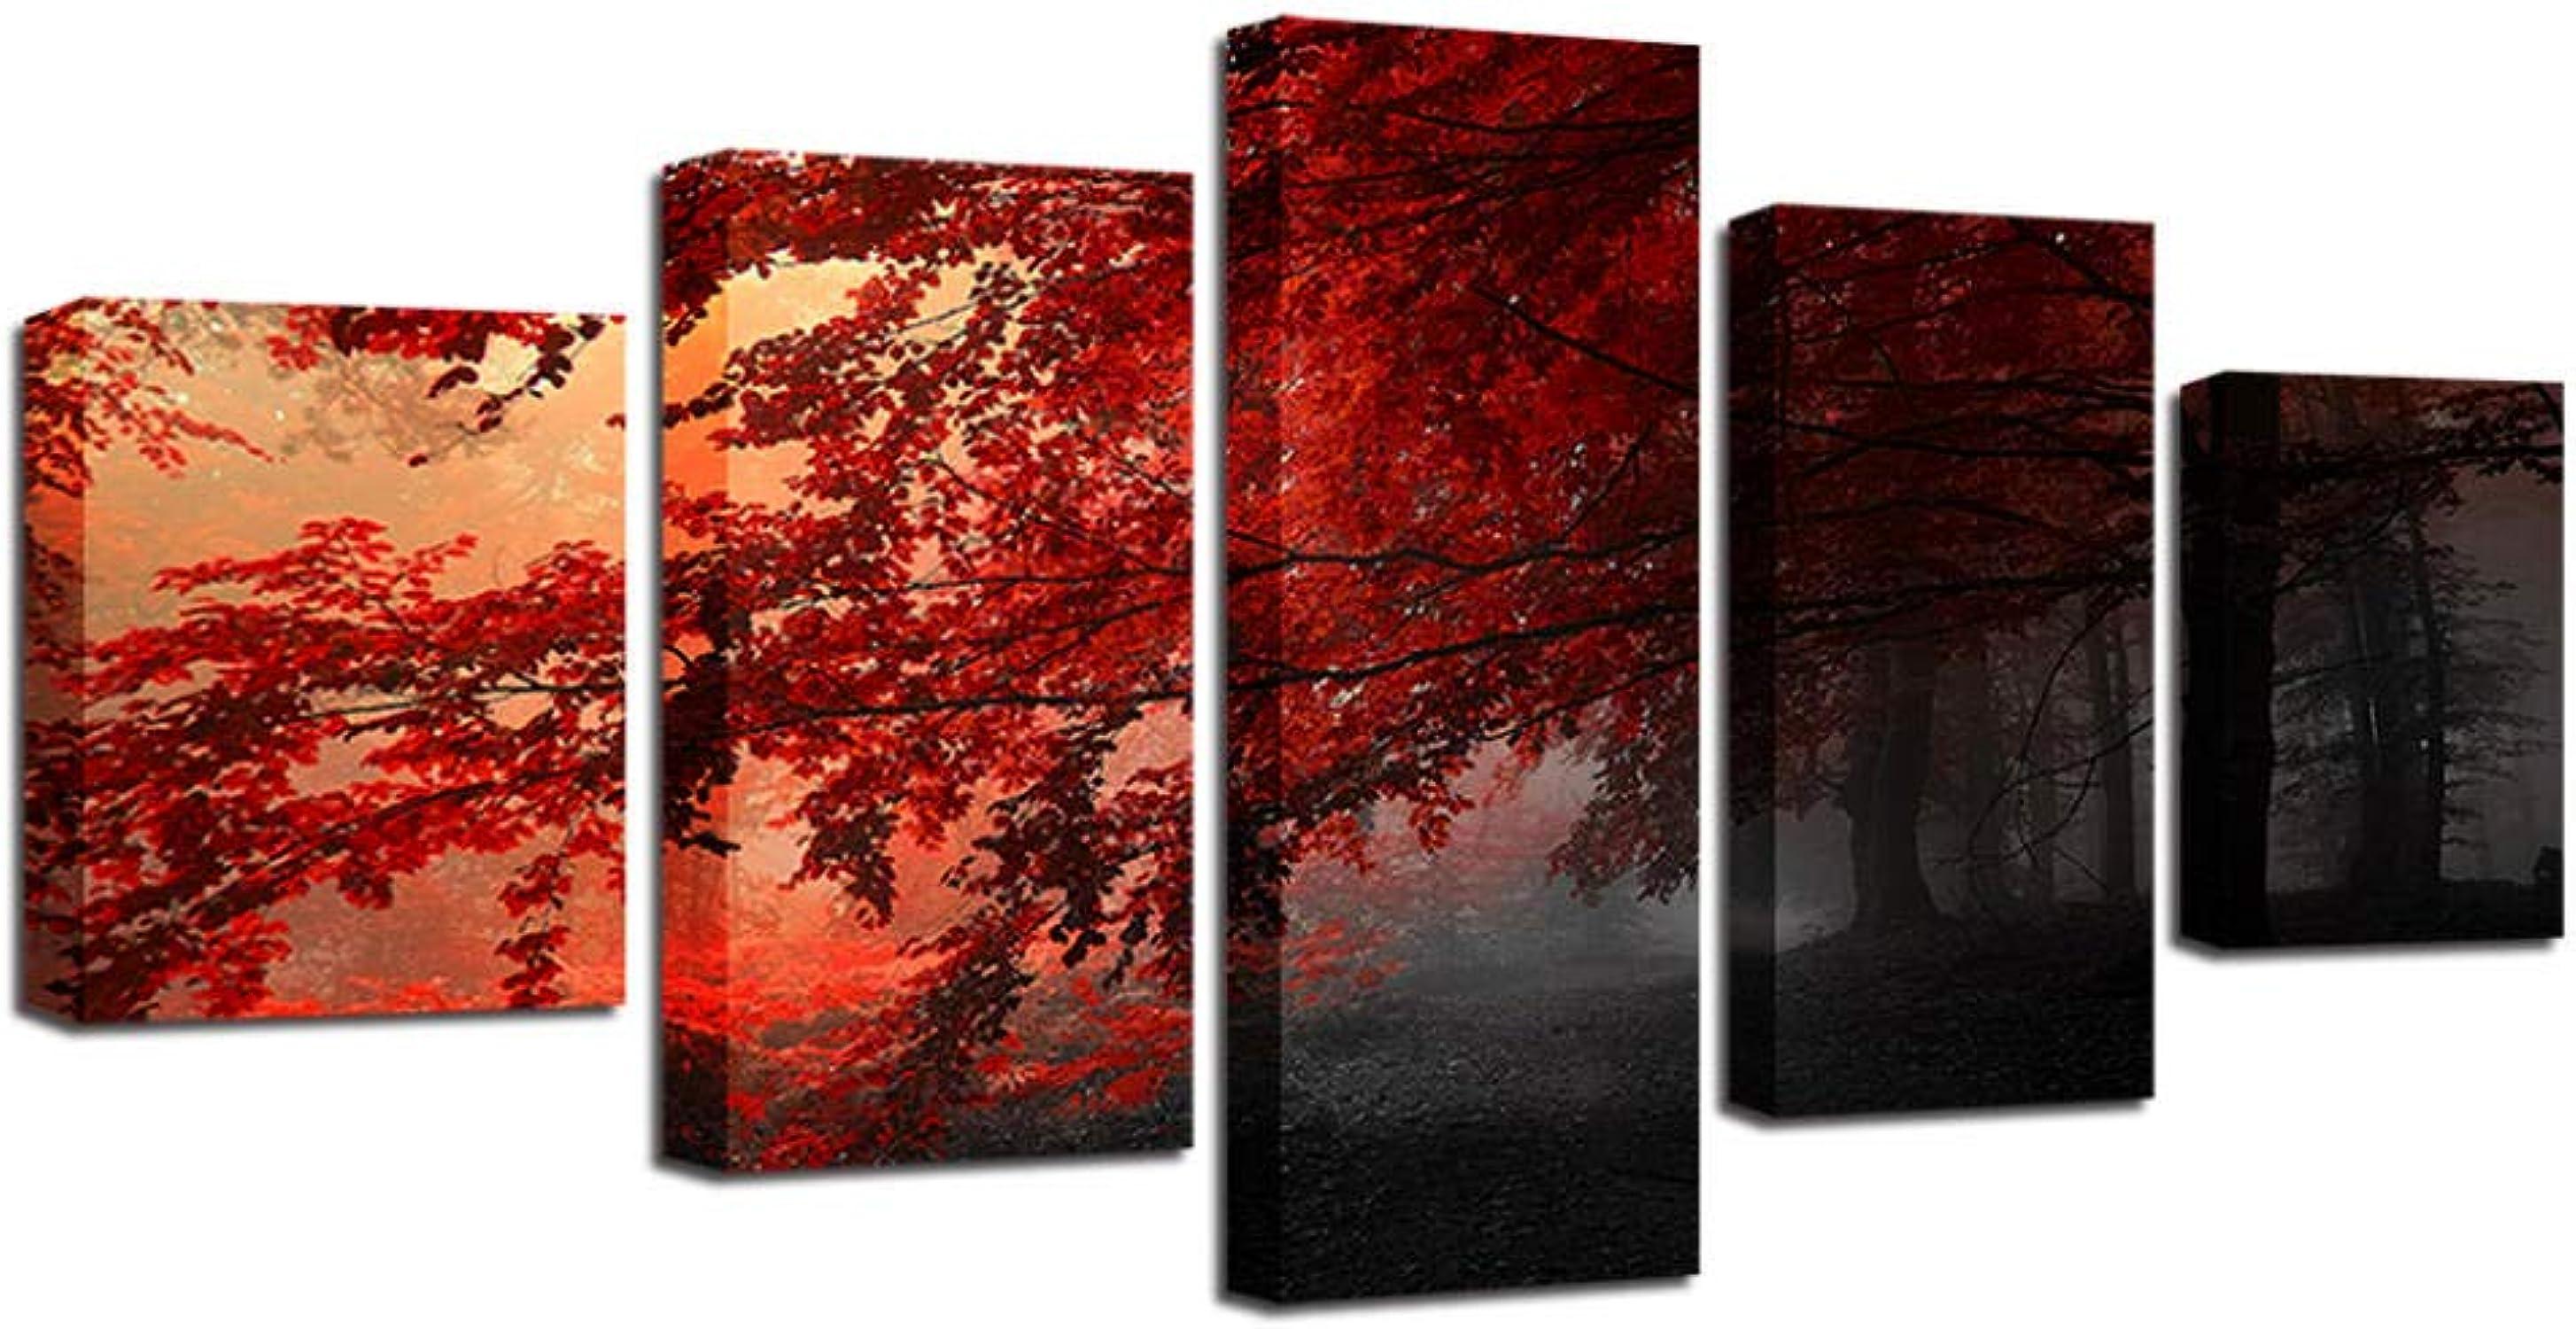 soporte minorista mayorista GZHMW GZHMW GZHMW Cuadros 5 Piezas Moderno Bosque De Arce Lienzos Decorativos Salon 100x50cm Listos para Colgar  ventas en línea de venta